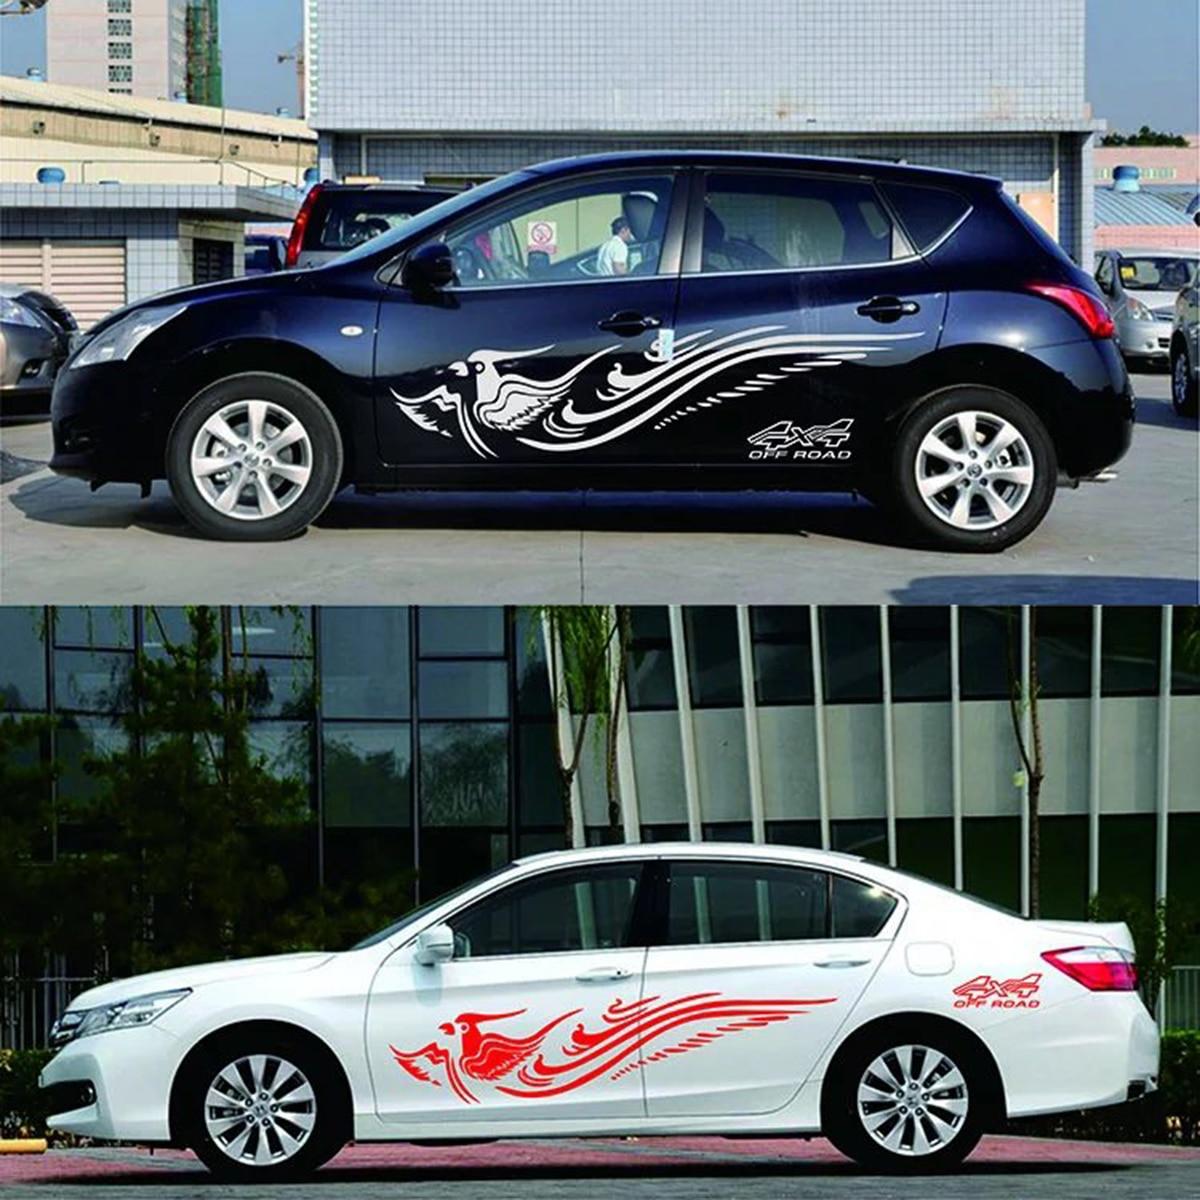 Car body sticker design singapore - Car Truck Flying Phoenix Graphics Vinyl Body Decal Side Animal Hood Sticker Phoenix Car Stickers For